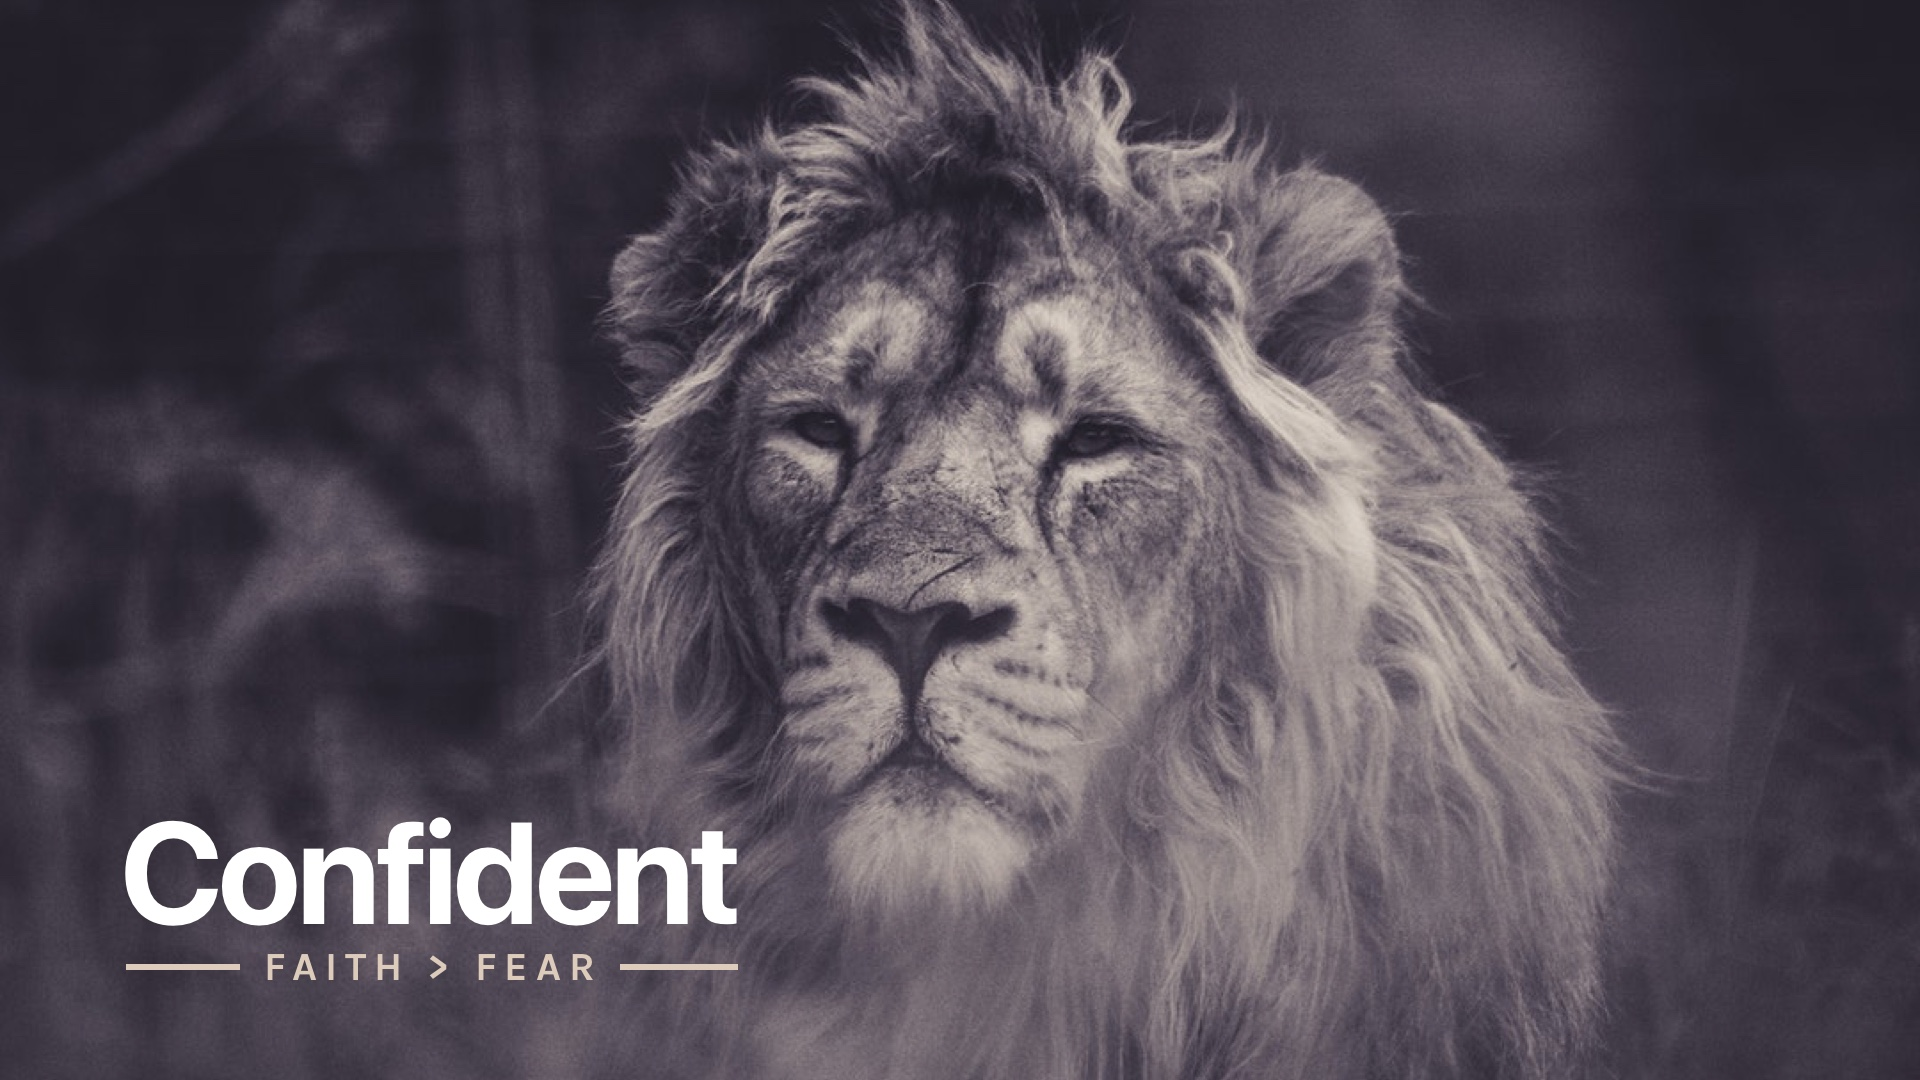 Confident-HD.jpg